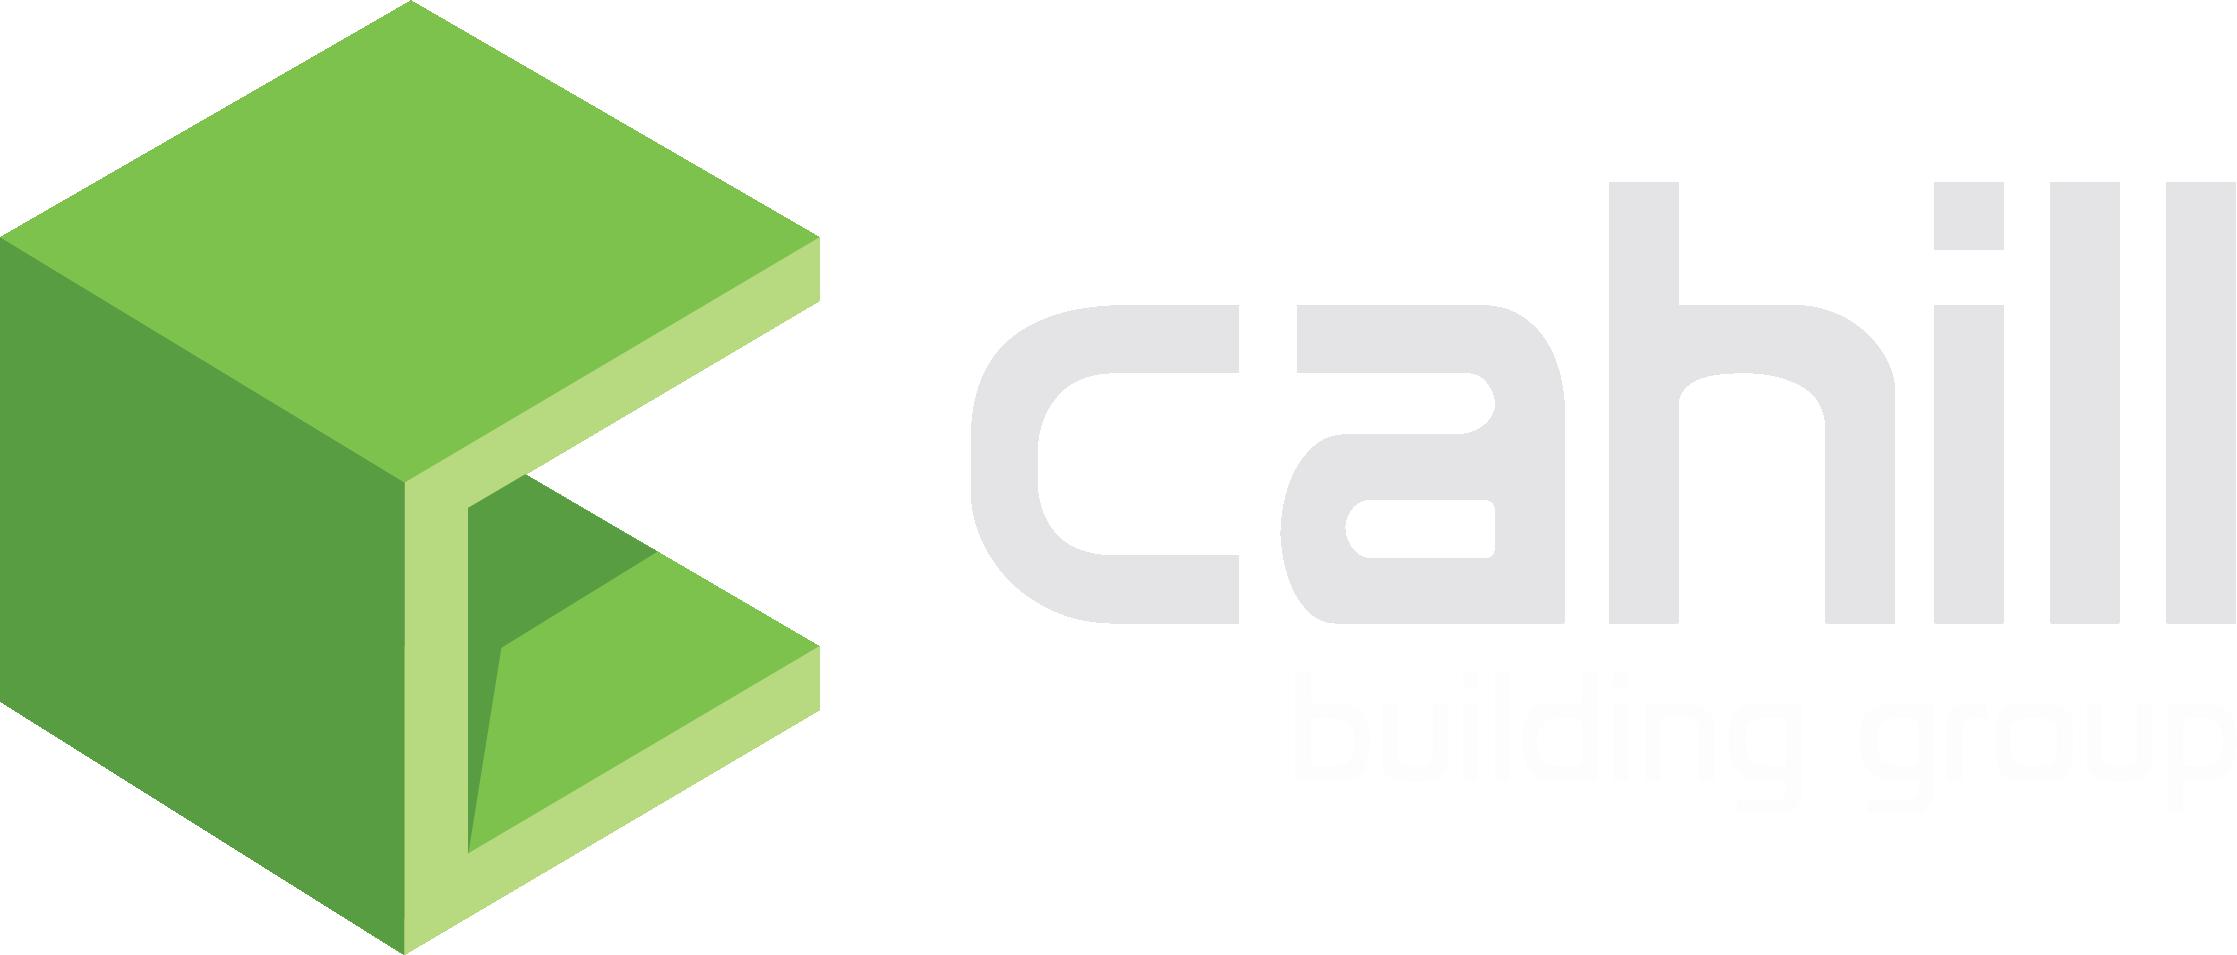 CAHILL-BG_Logo-01 white